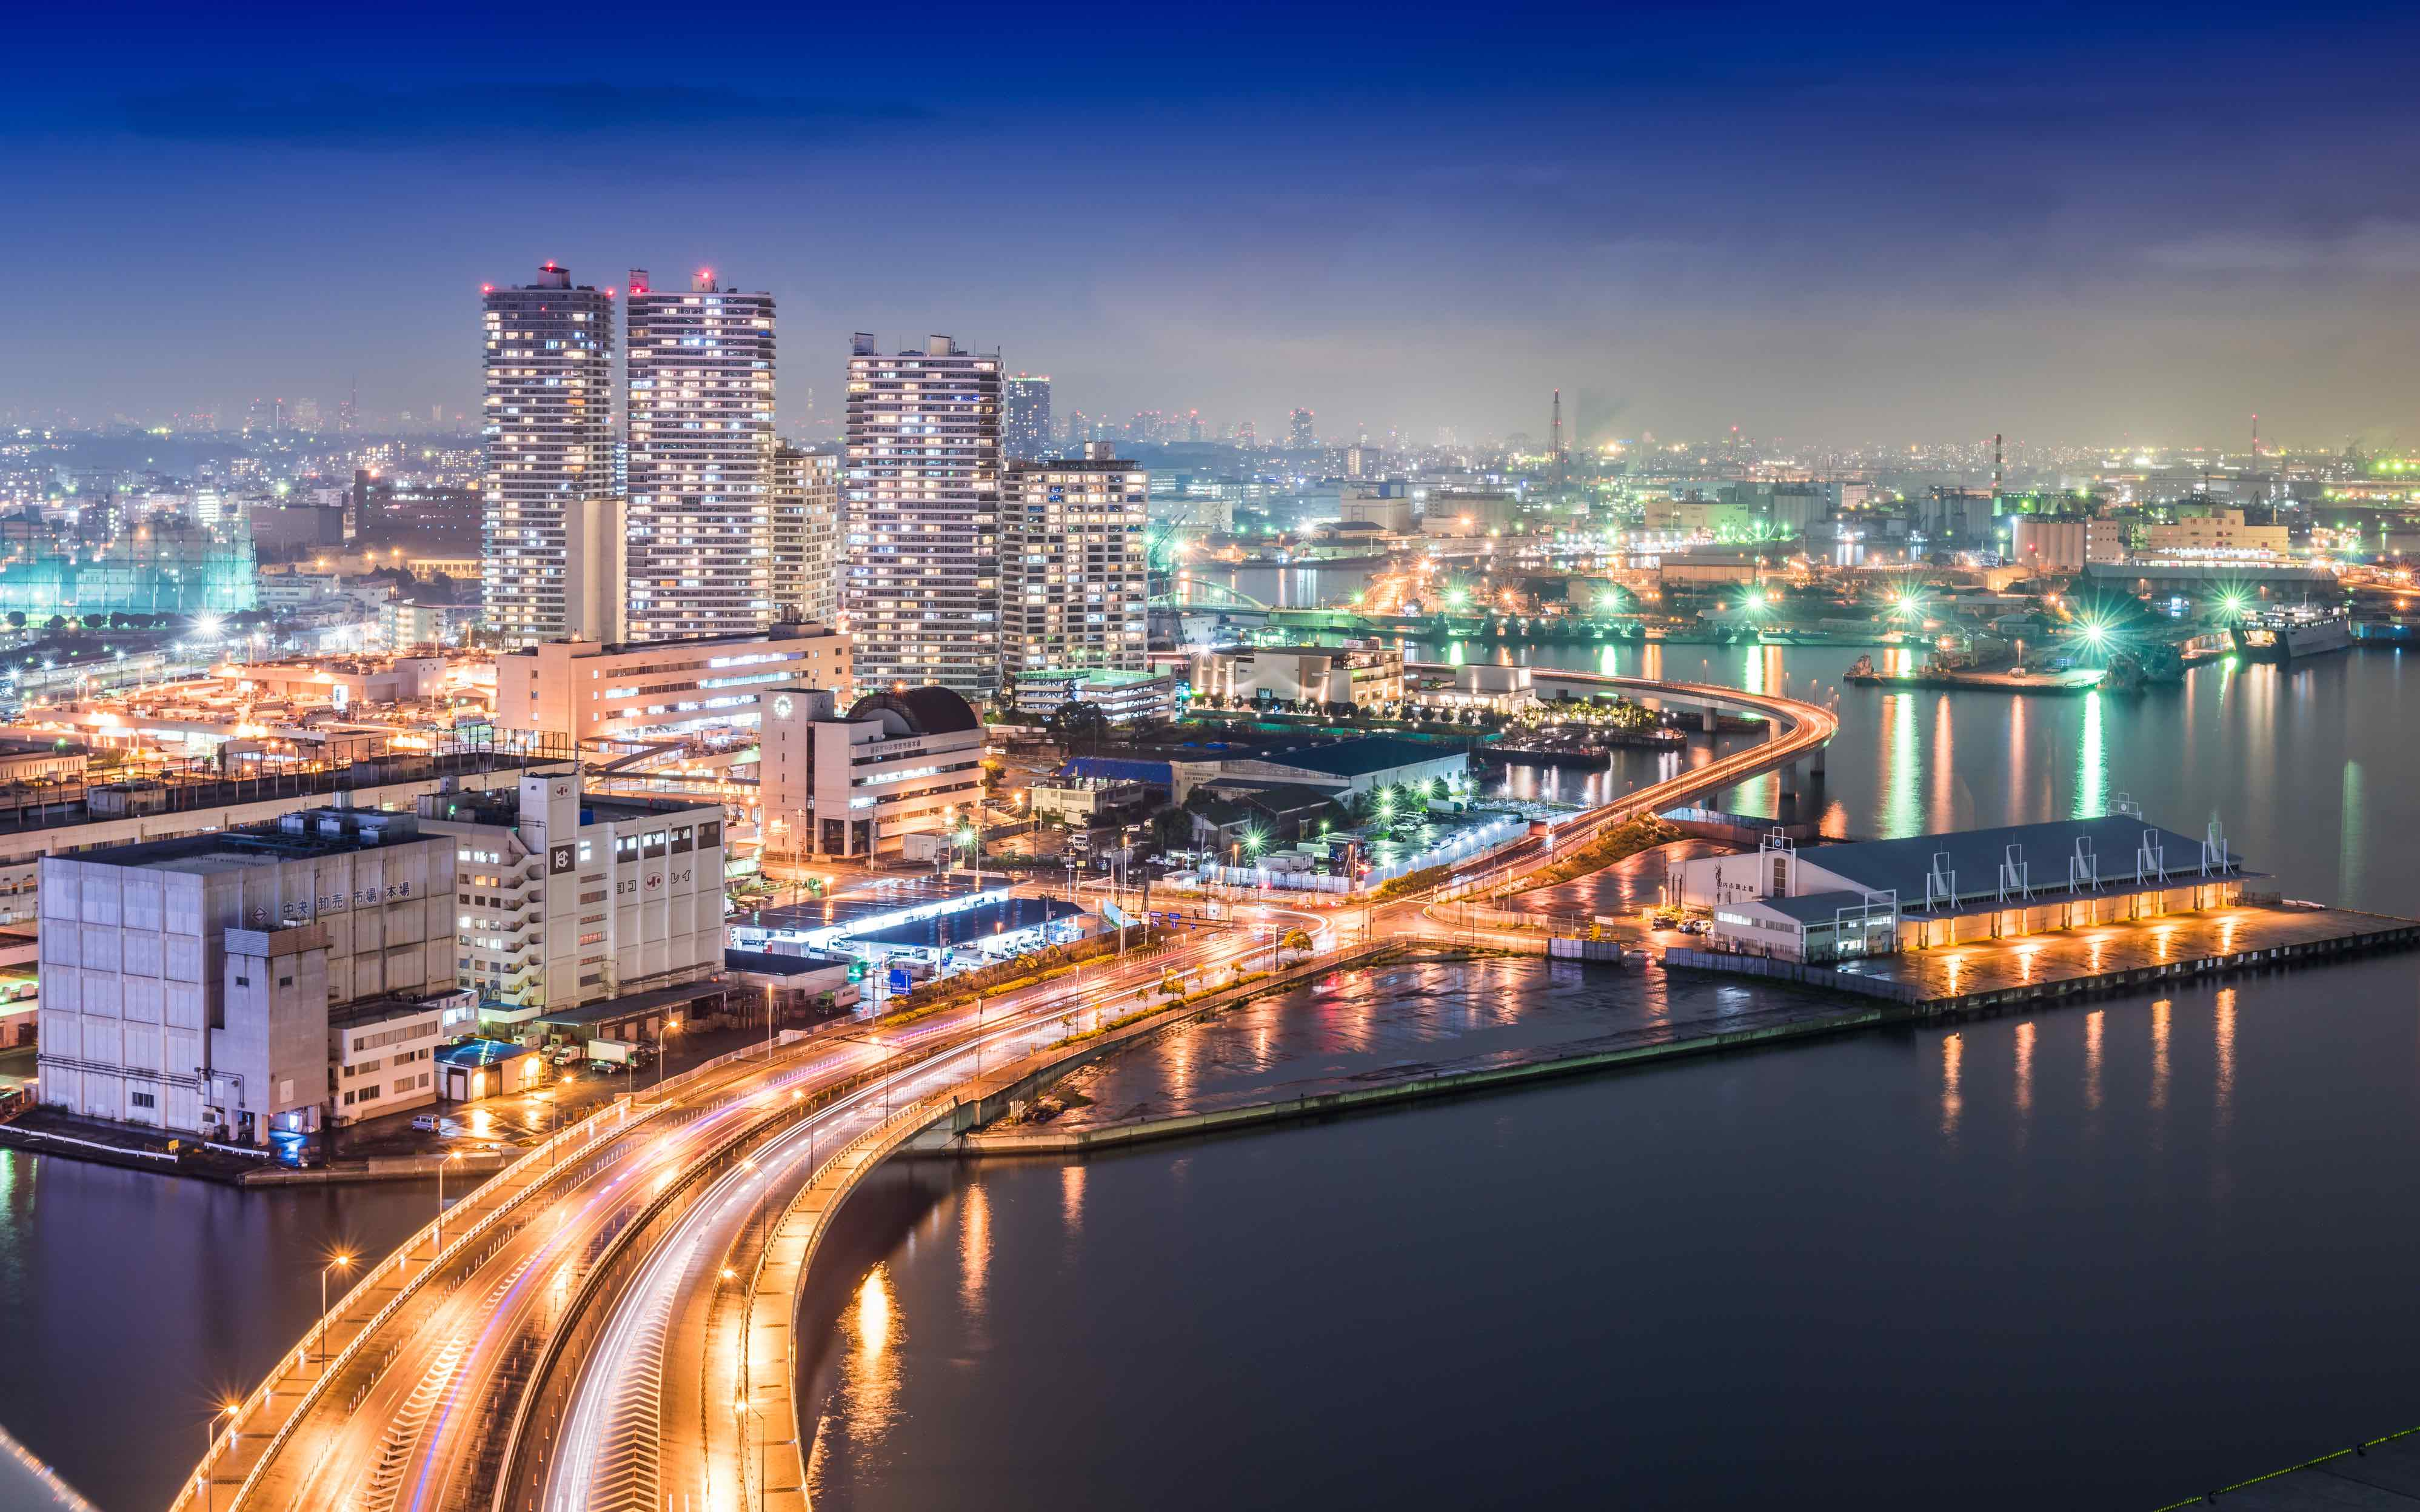 Keihin Industrial Zone Tour